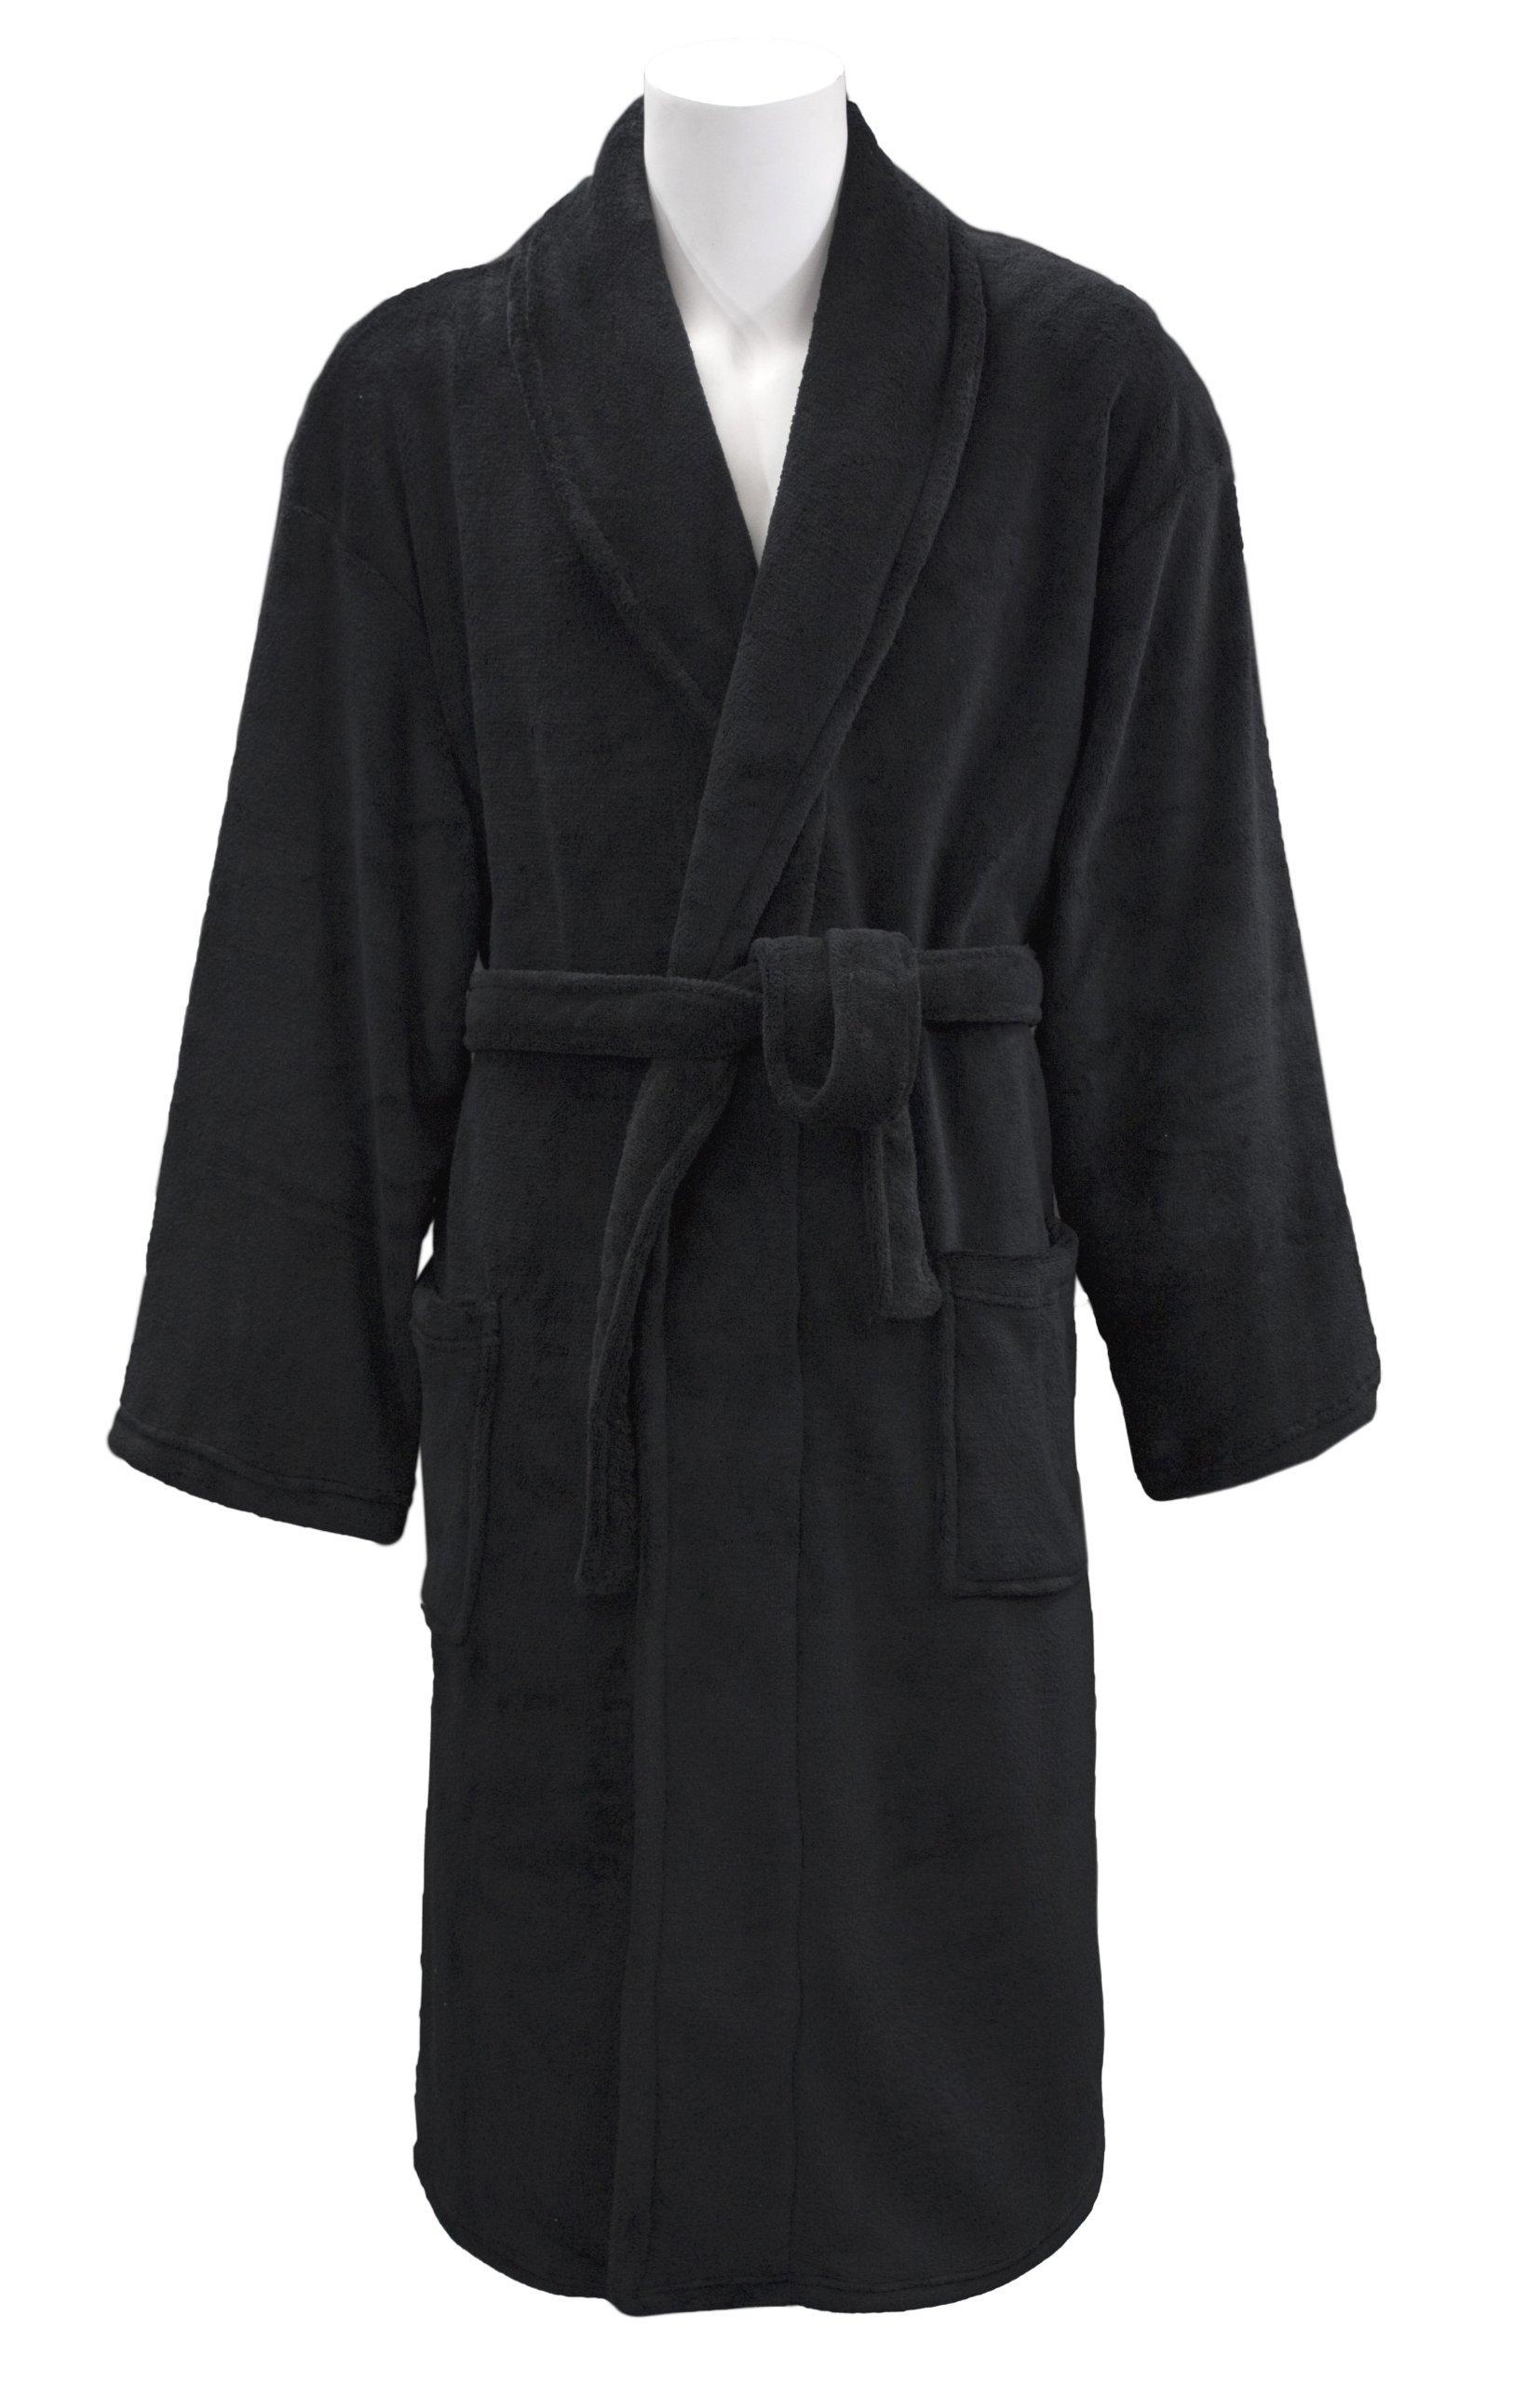 Leisureland Men's Coral Fleece Spa Bathrobe Robes 48'' Black by Leisureland